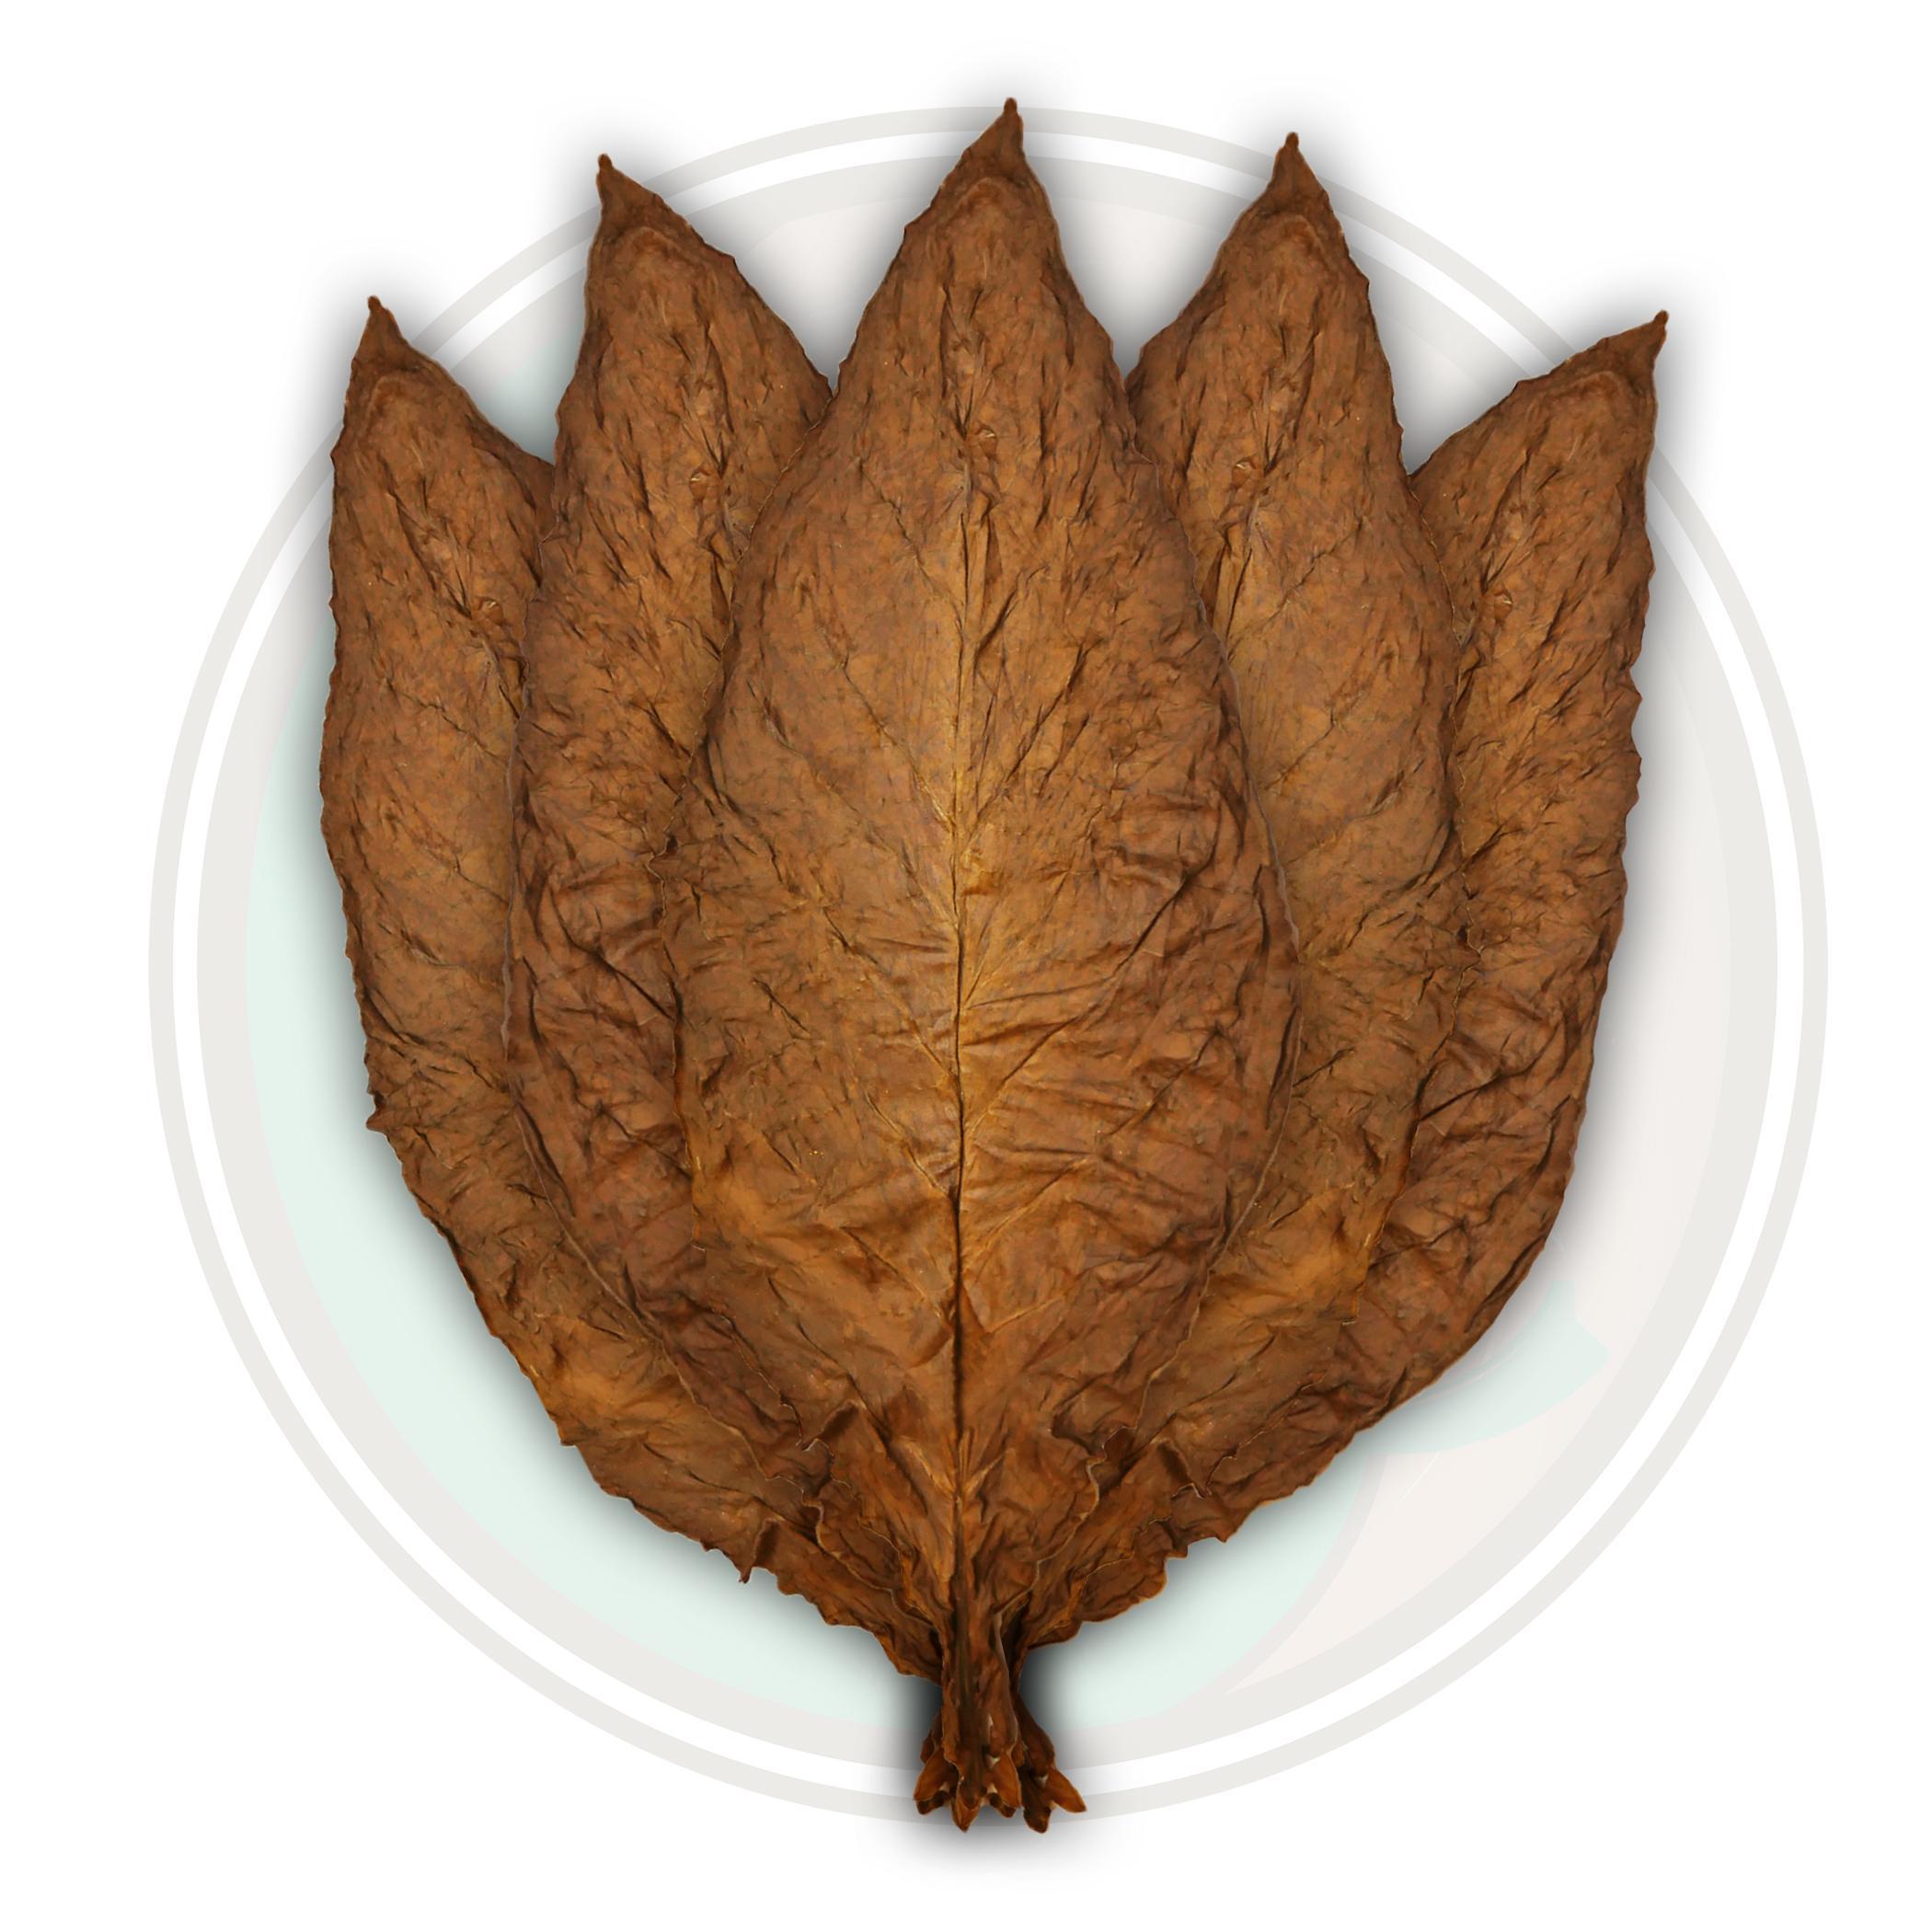 Fanta Leaves - QB-52 Fronto Wrapper Tobacco Leaves for Sale Online!